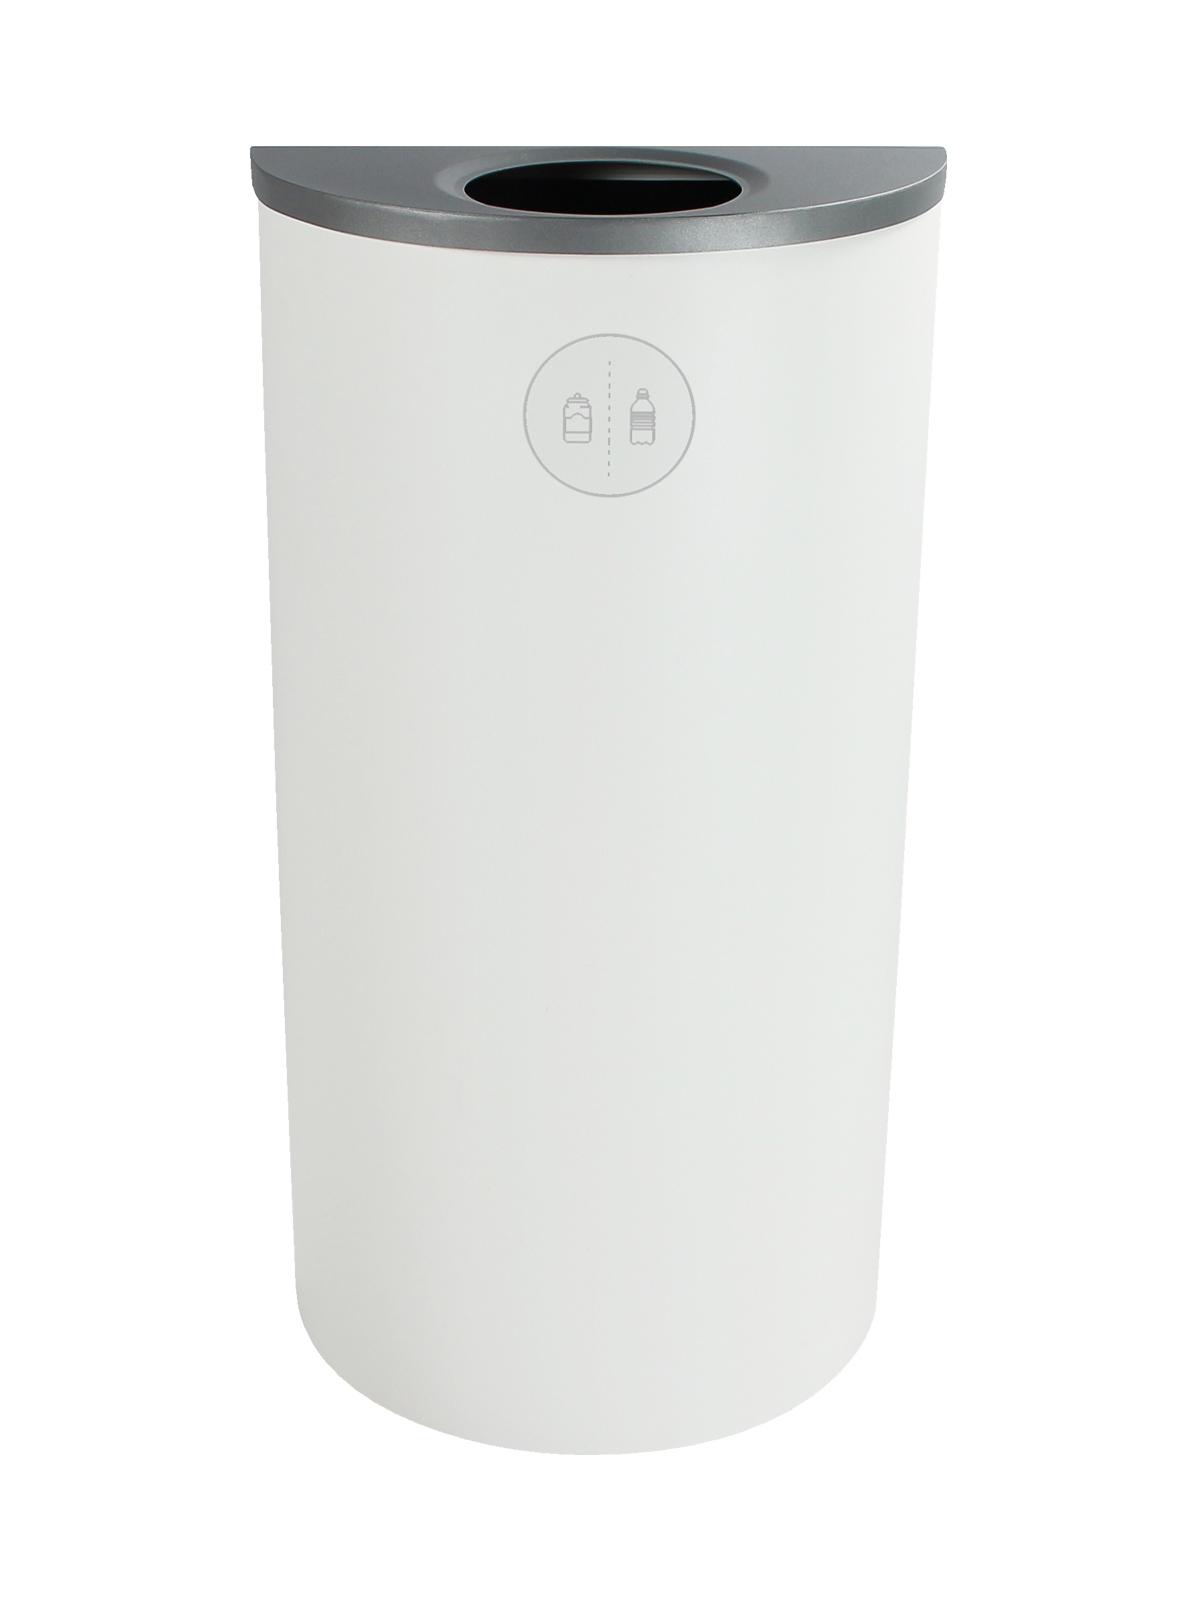 SPECTRUM - Single - Ellipse Slim - Cans & Bottles - Circle - White